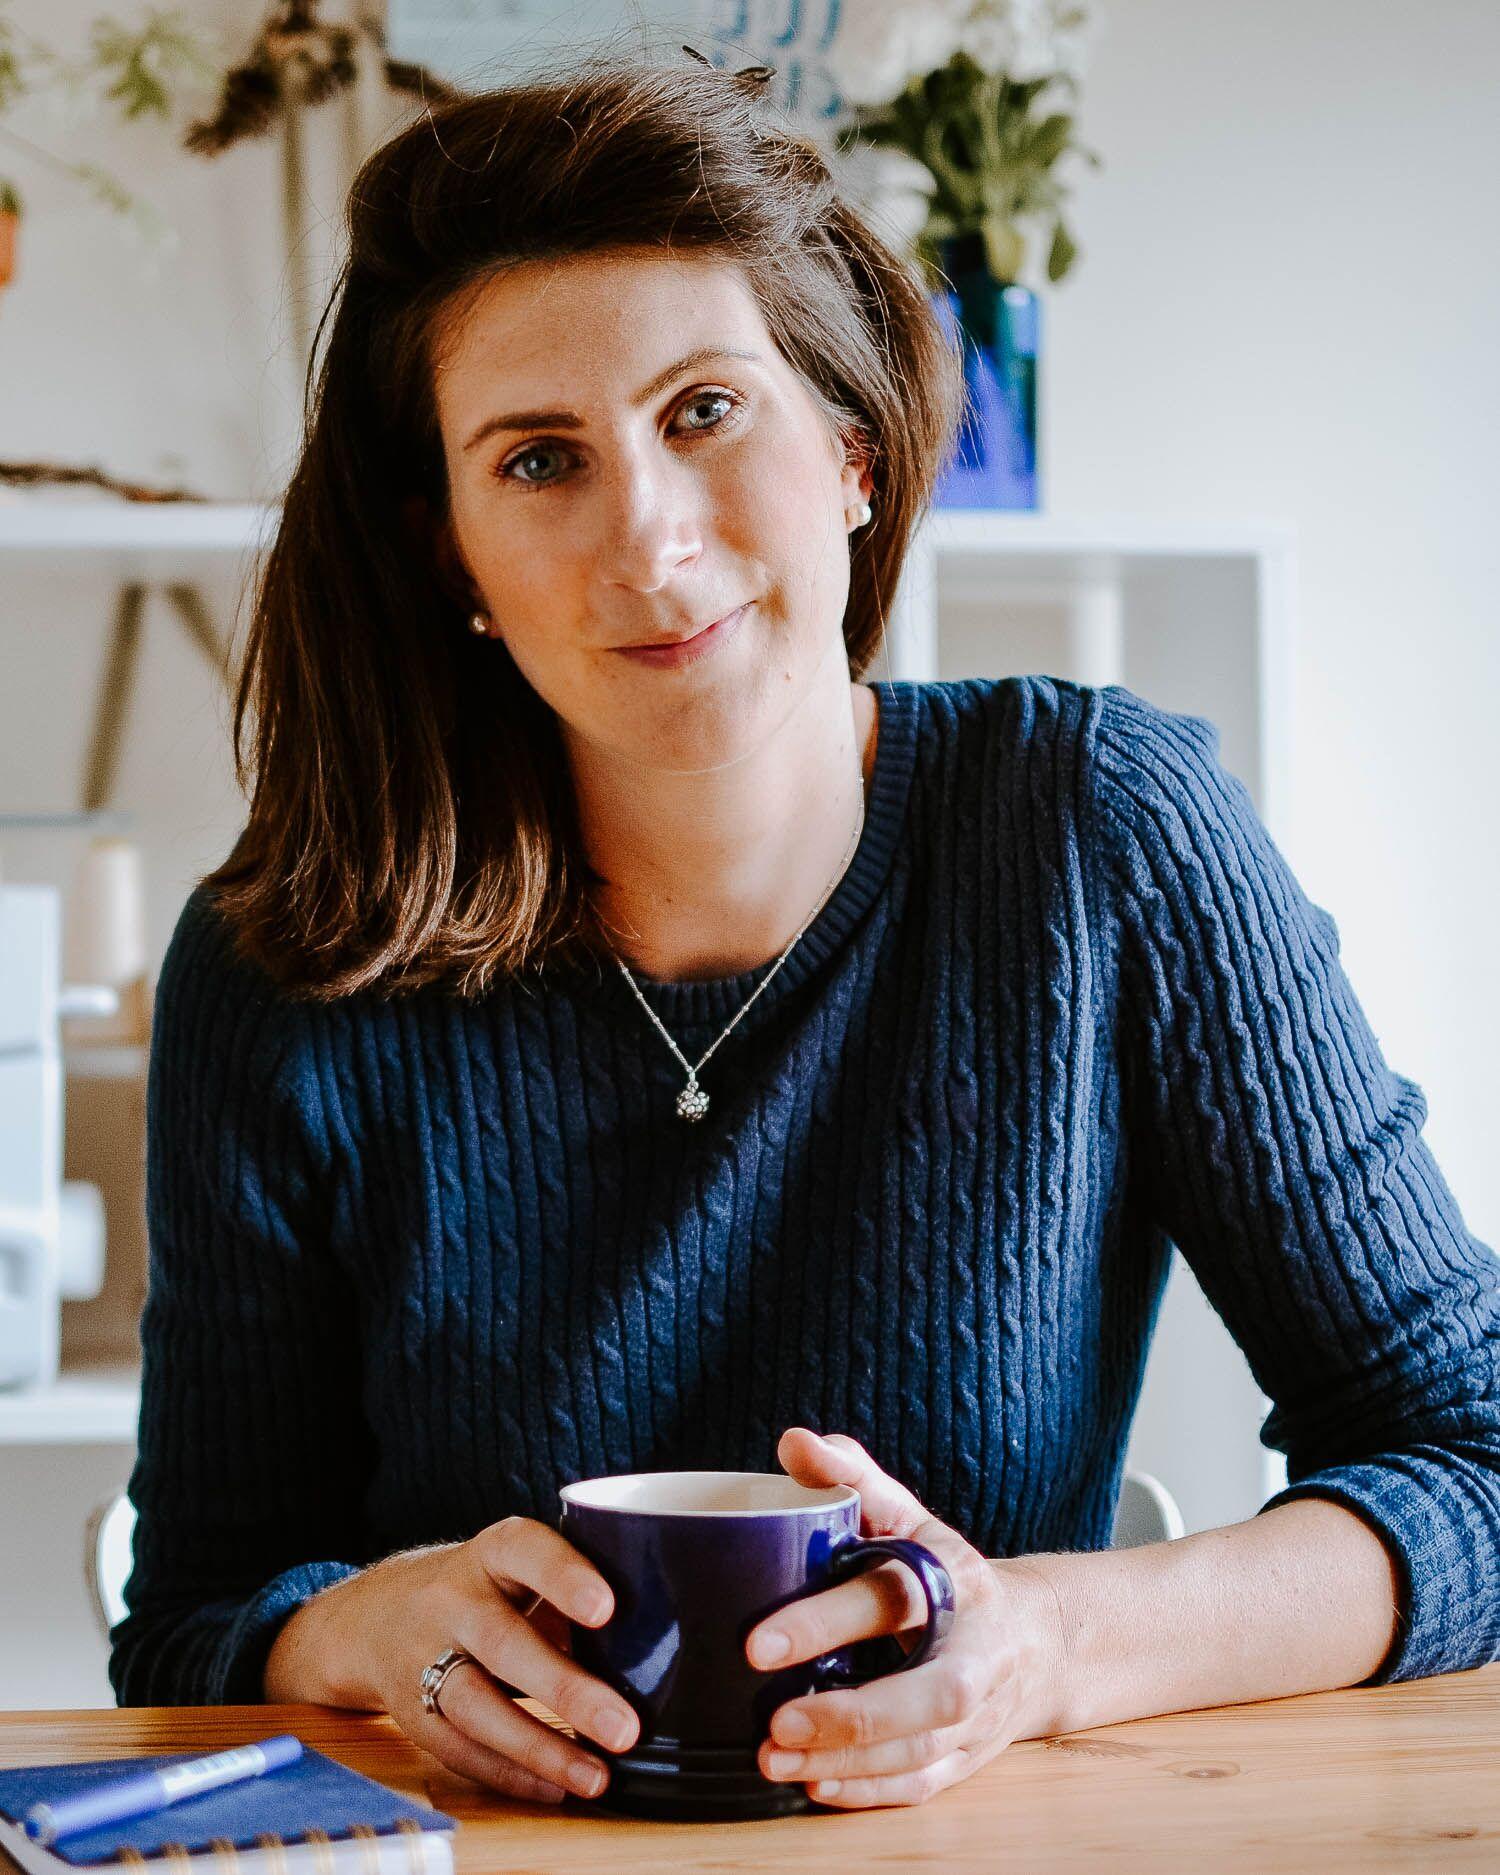 Planning and productivity mentor Josephine Brooks